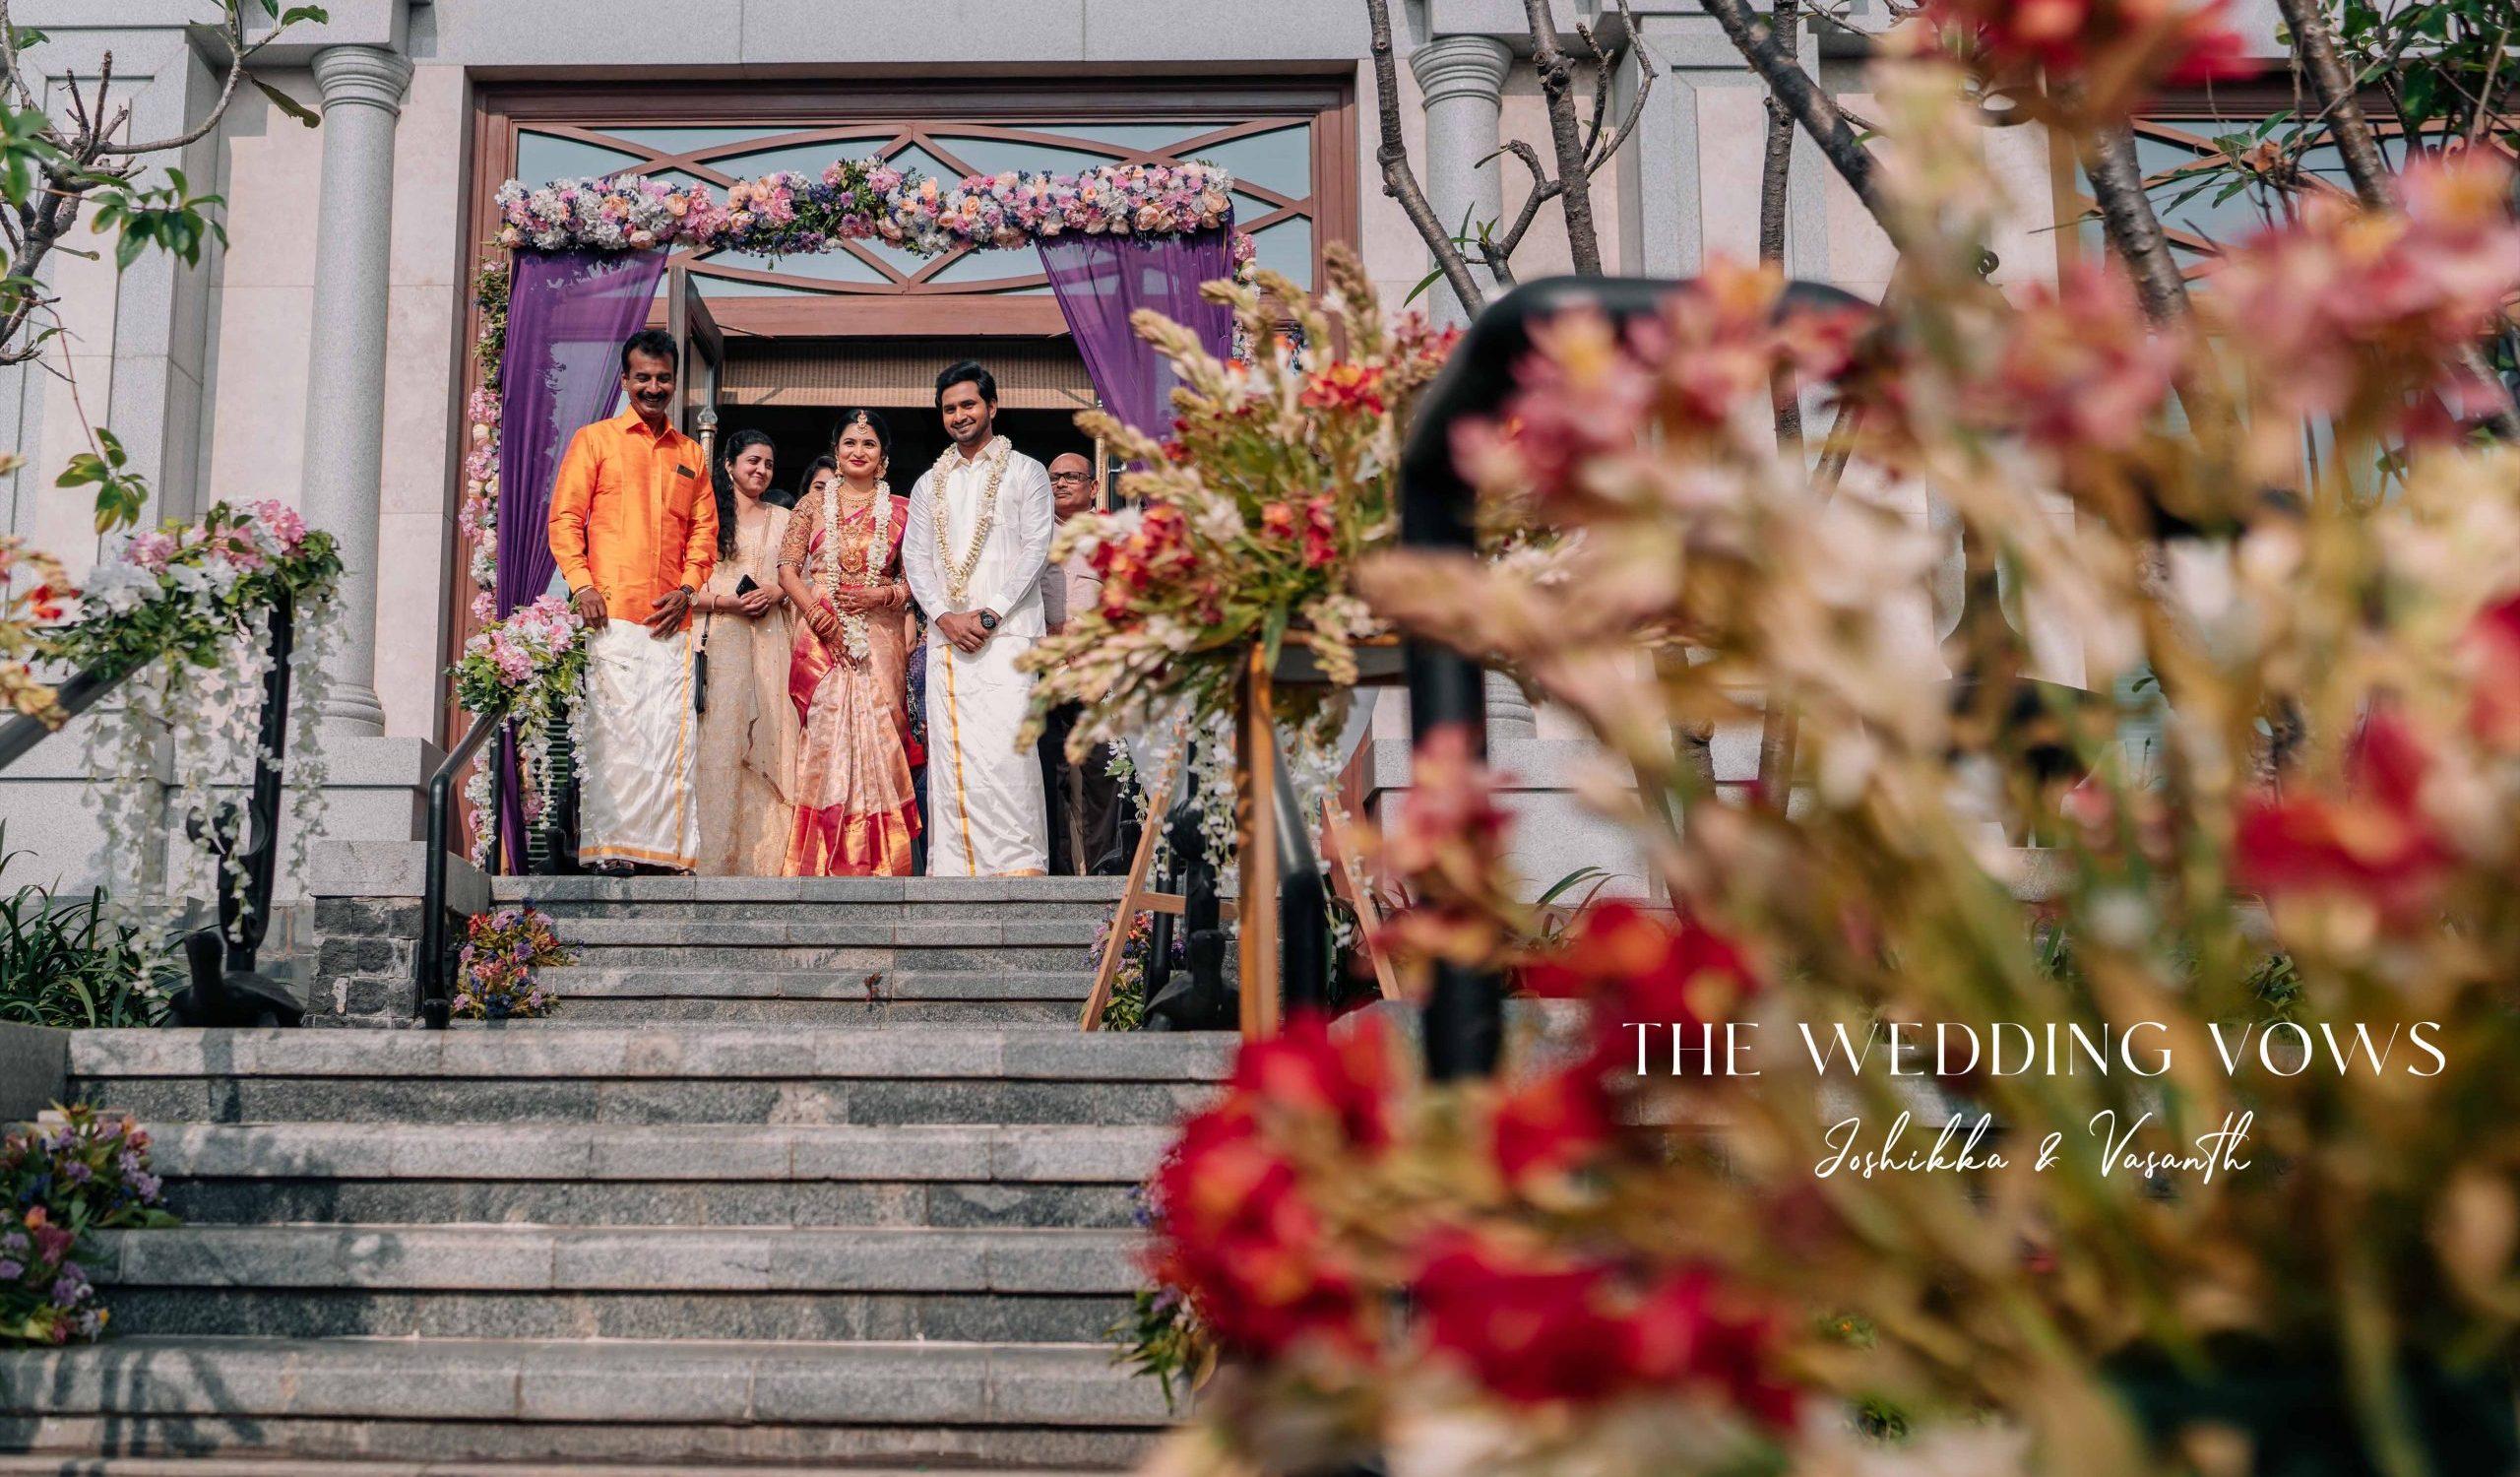 Joshikka _ Vasanth wed